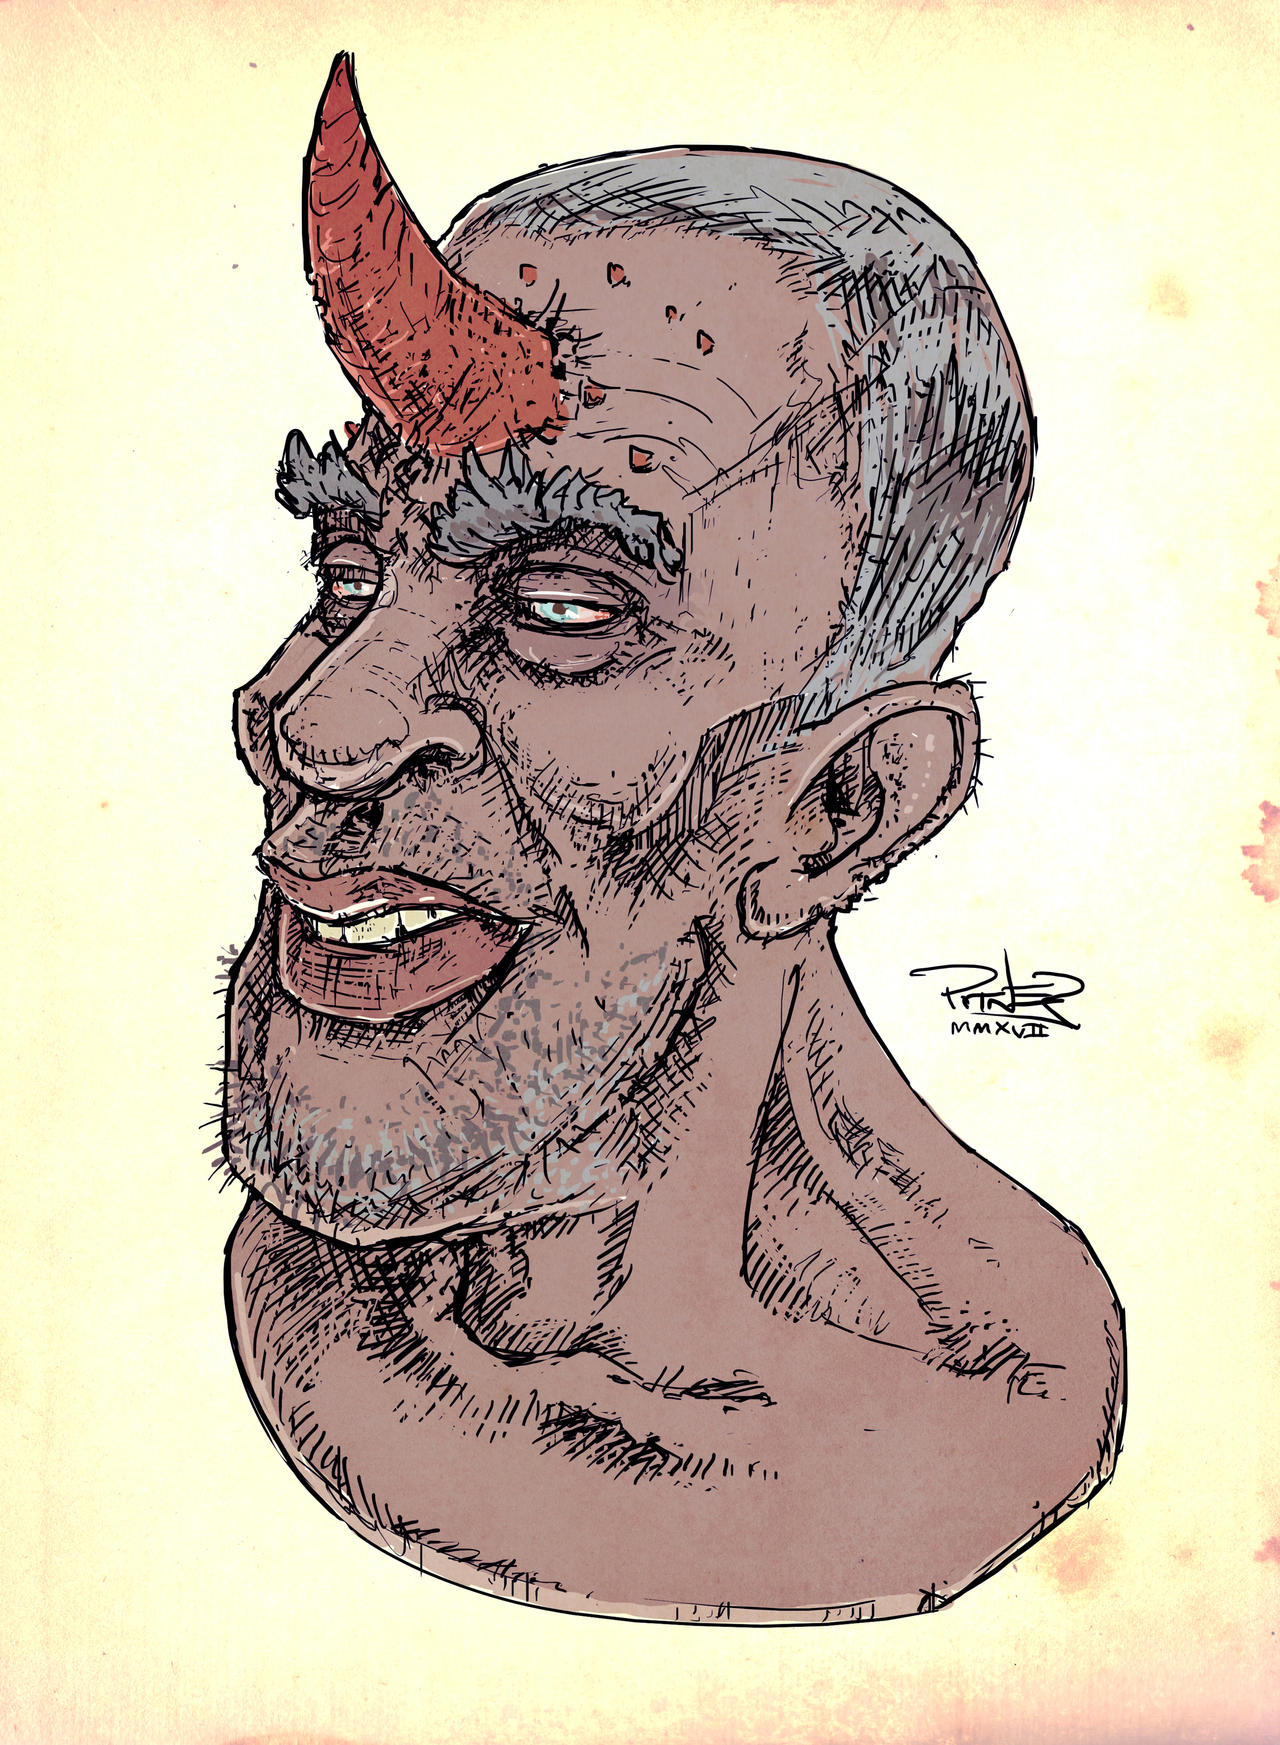 Horny Dude by pitnerd